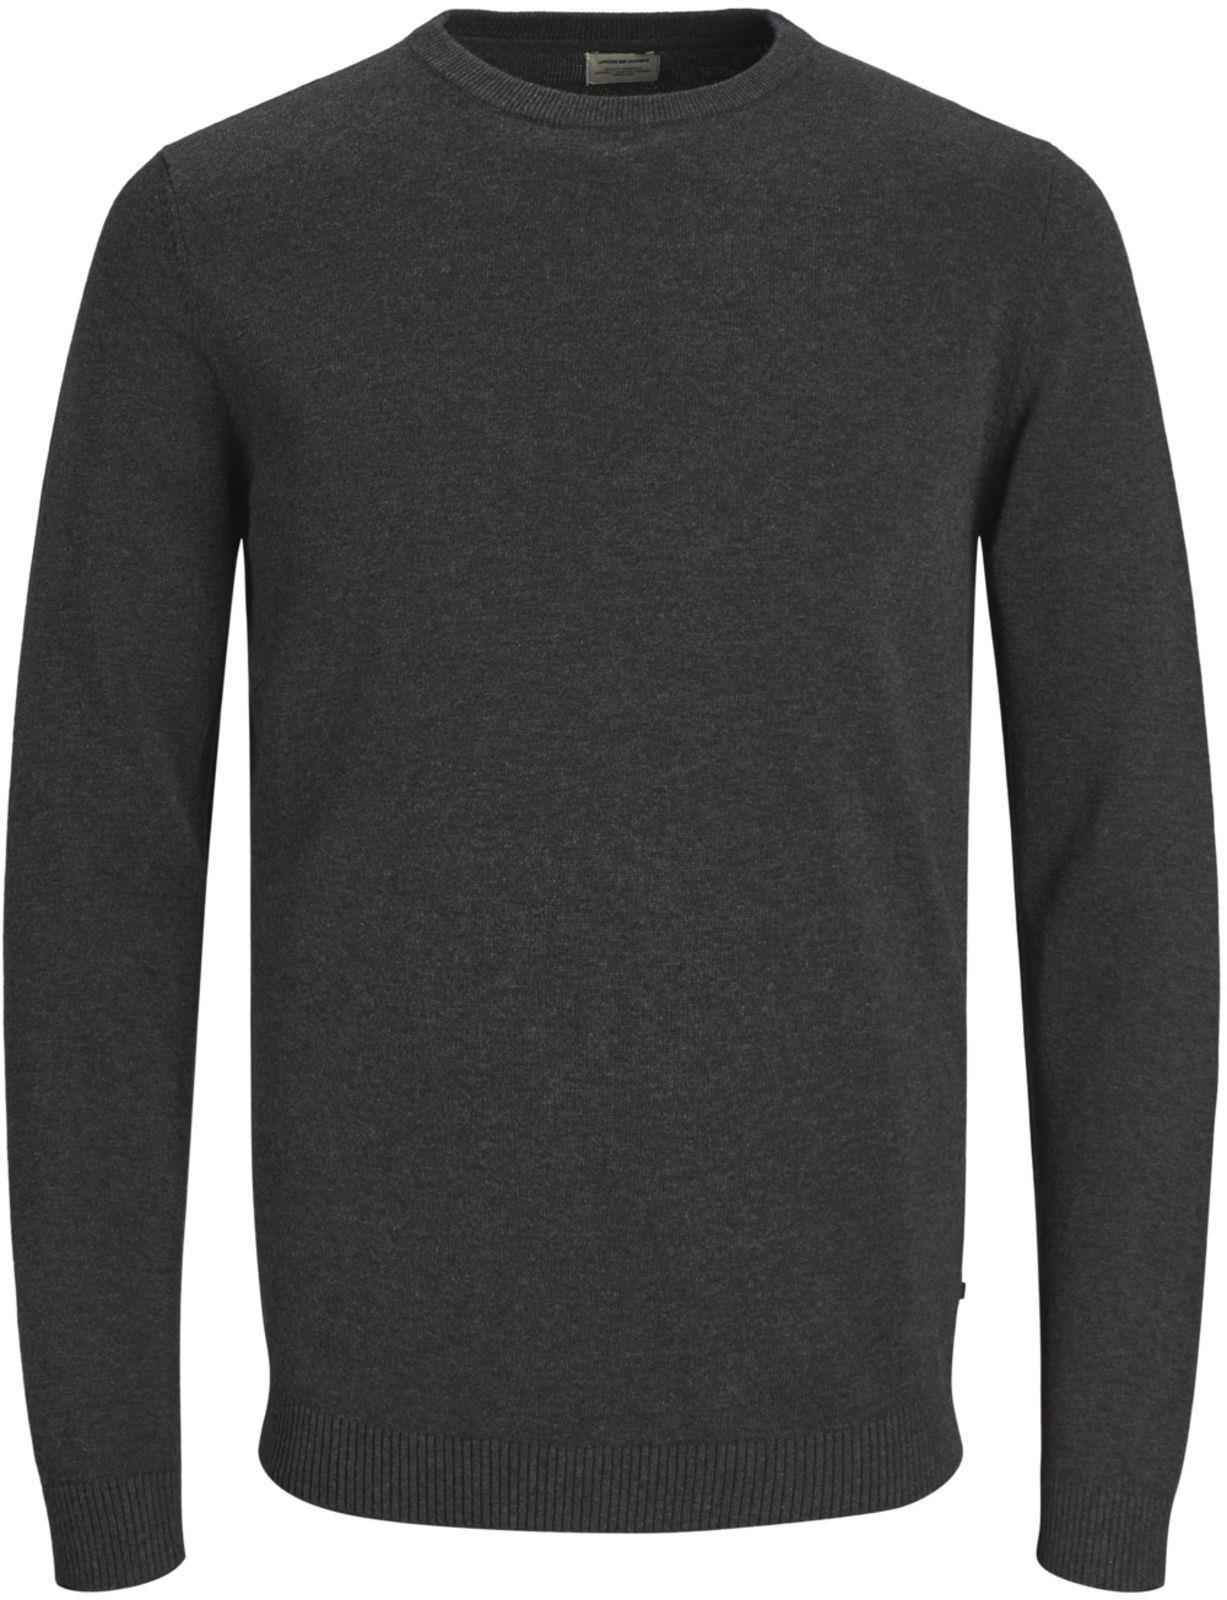 Jack-amp-Jones-Jumpers-Sweaters-Cardigans-Assorted-S-XXL miniatuur 14